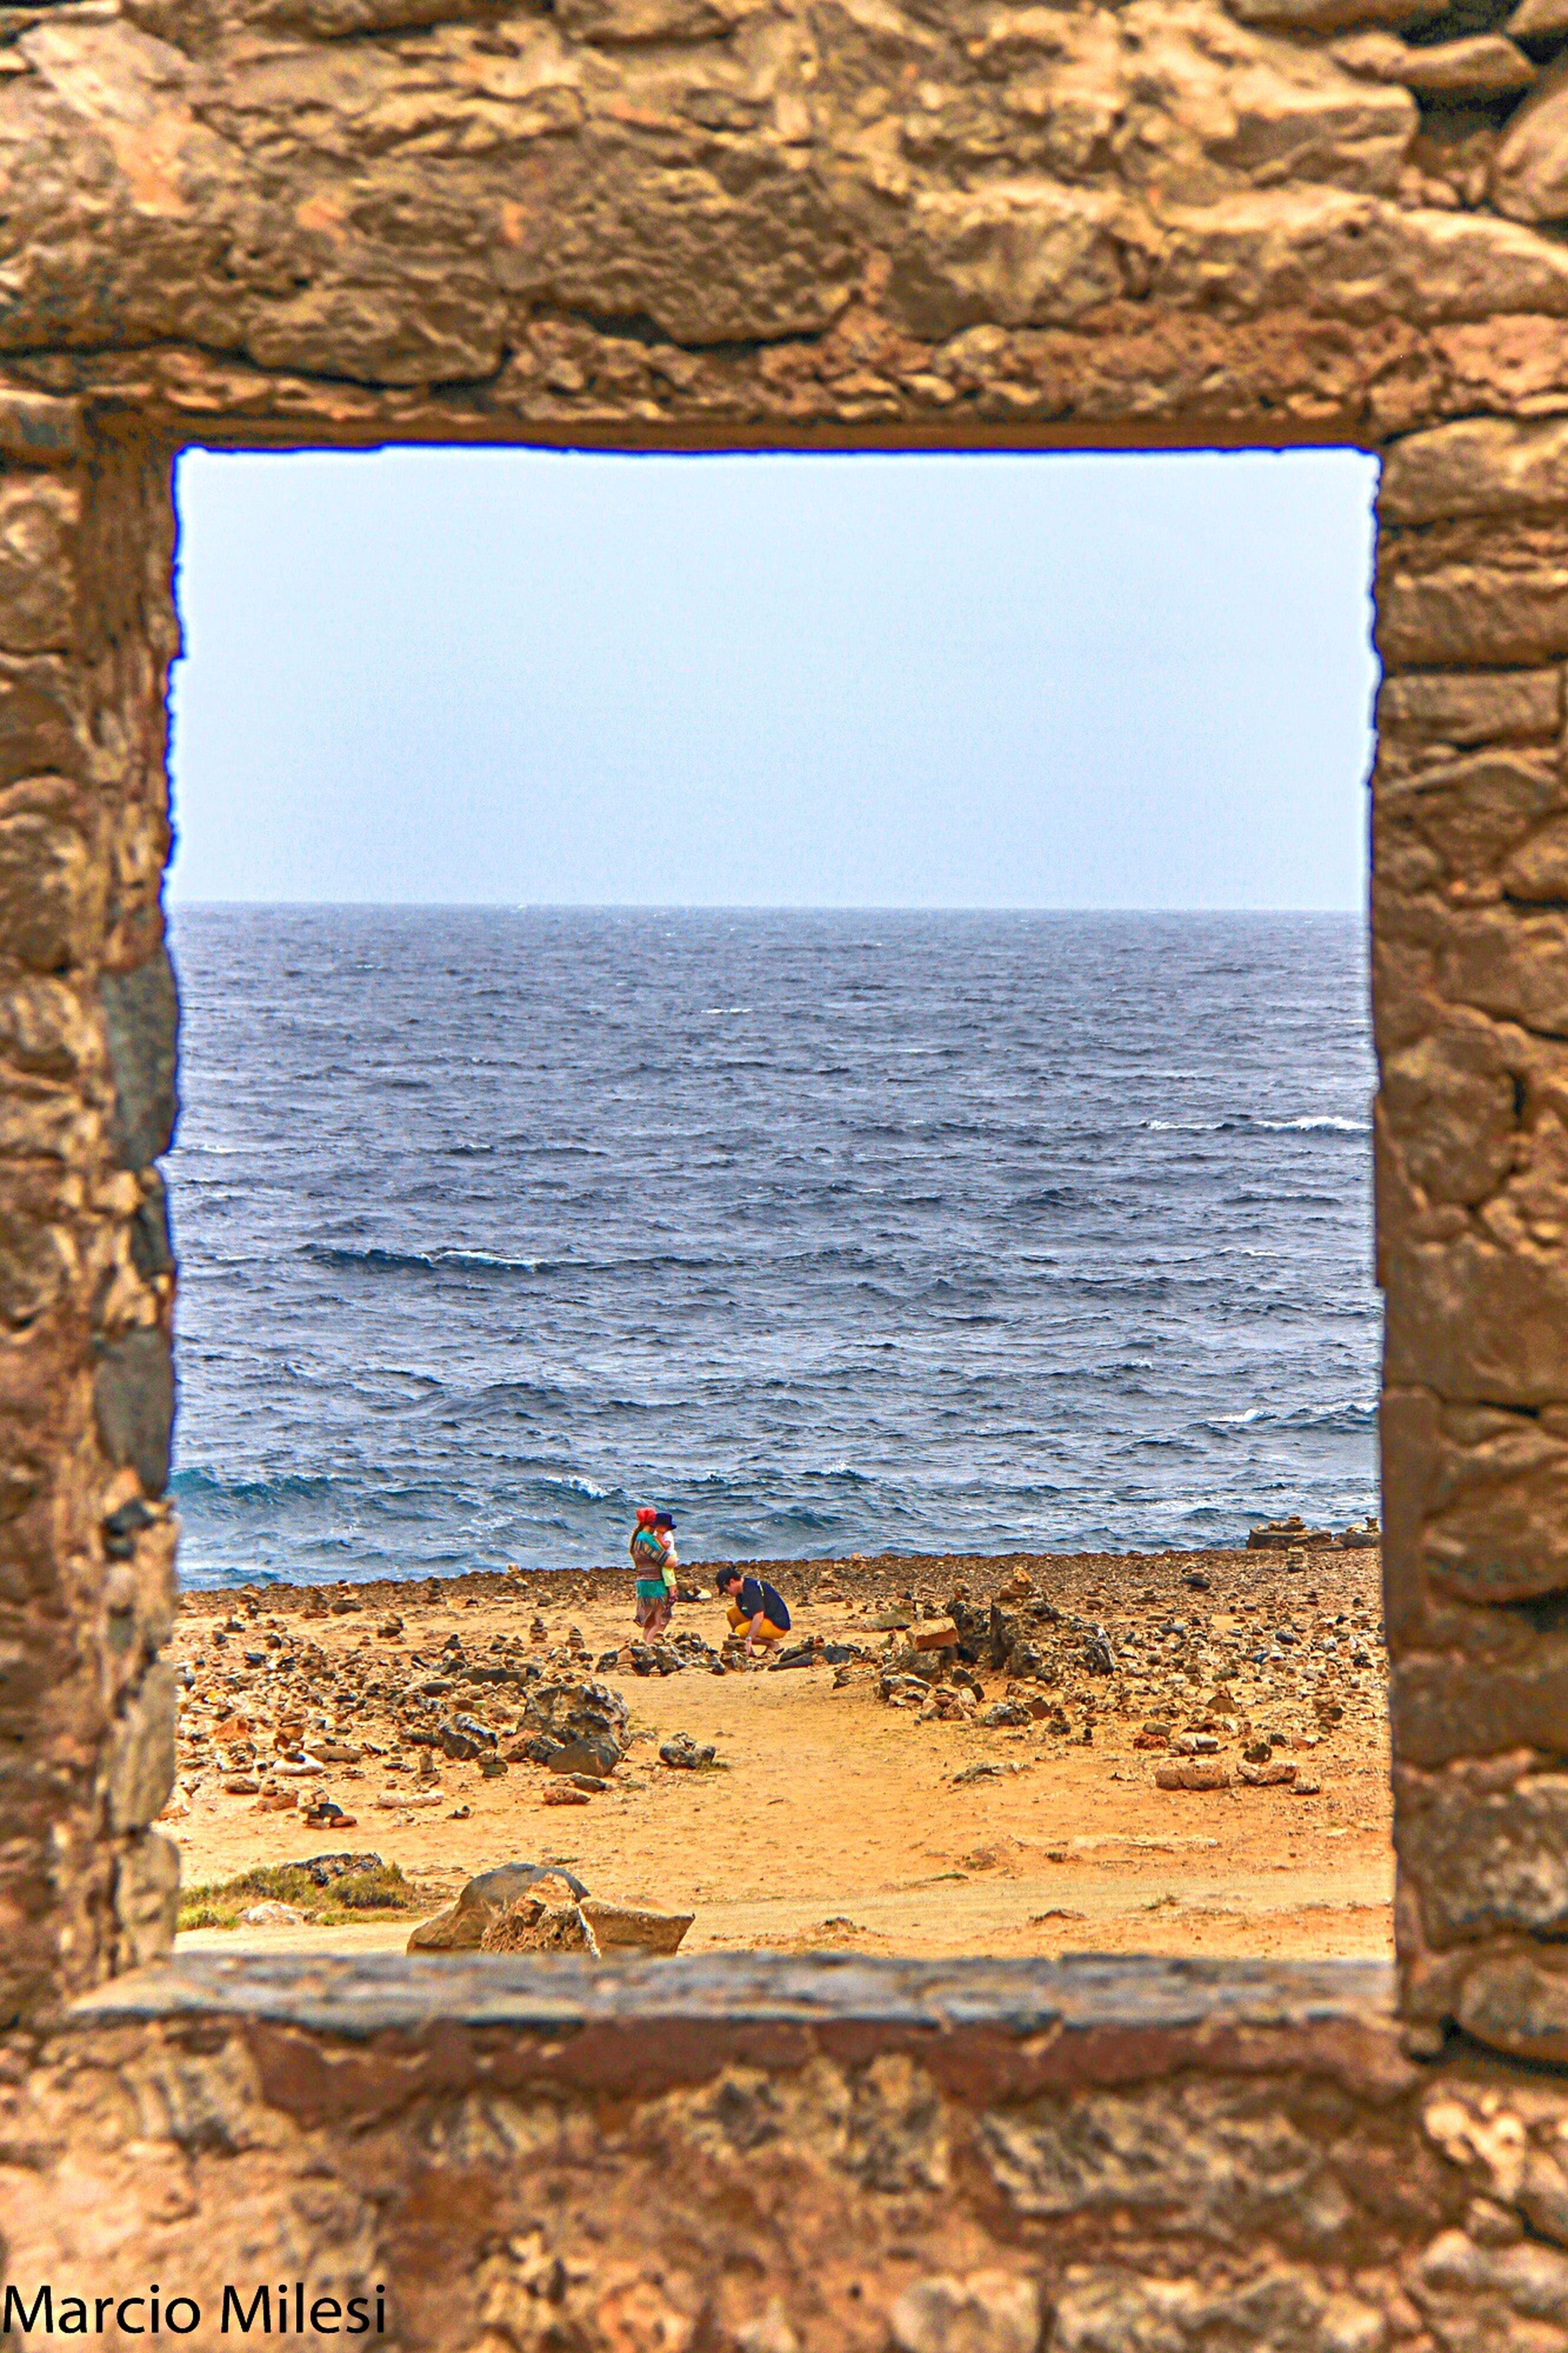 Window Windowforthesea Windowfortheparadise Aruba Aruba One Happy Island Sea Water Horizon Over Water Blue Day Lifestyles Leisure Activity Sky Nature Beauty In Nature Beach Harmony Harmony With Nature Ilovephotography